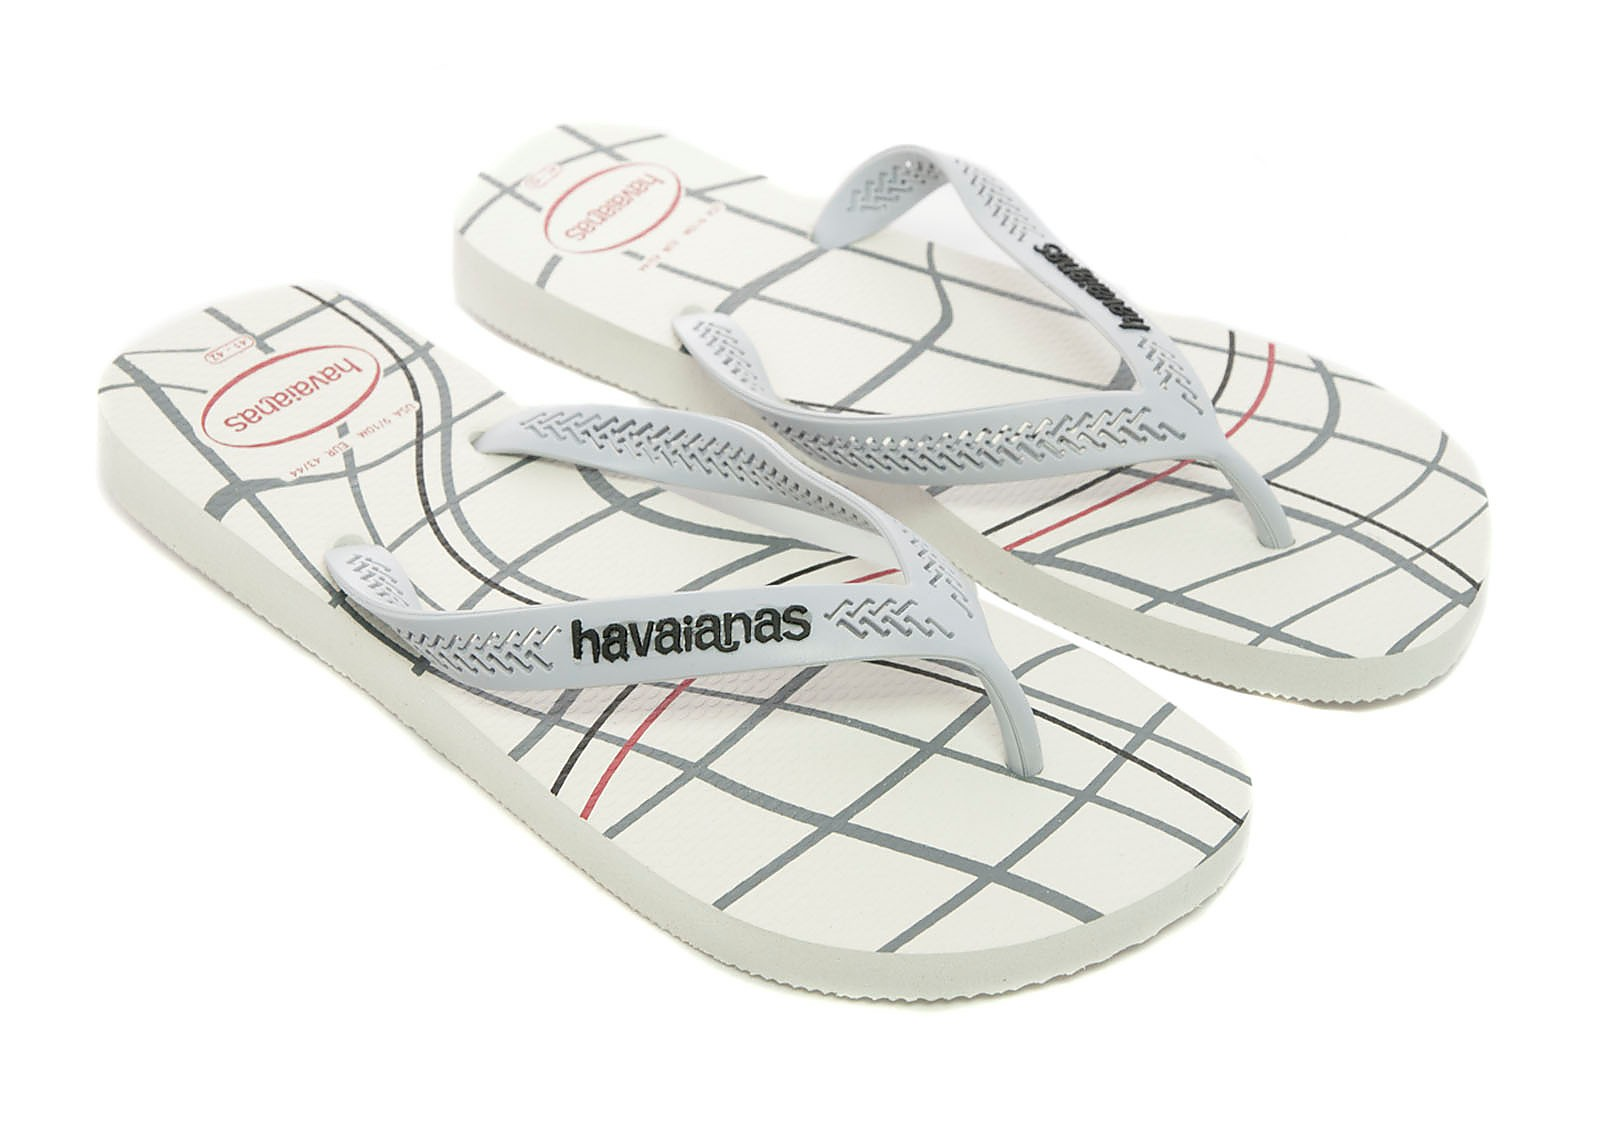 Havaianas Aero Print Flip Flops